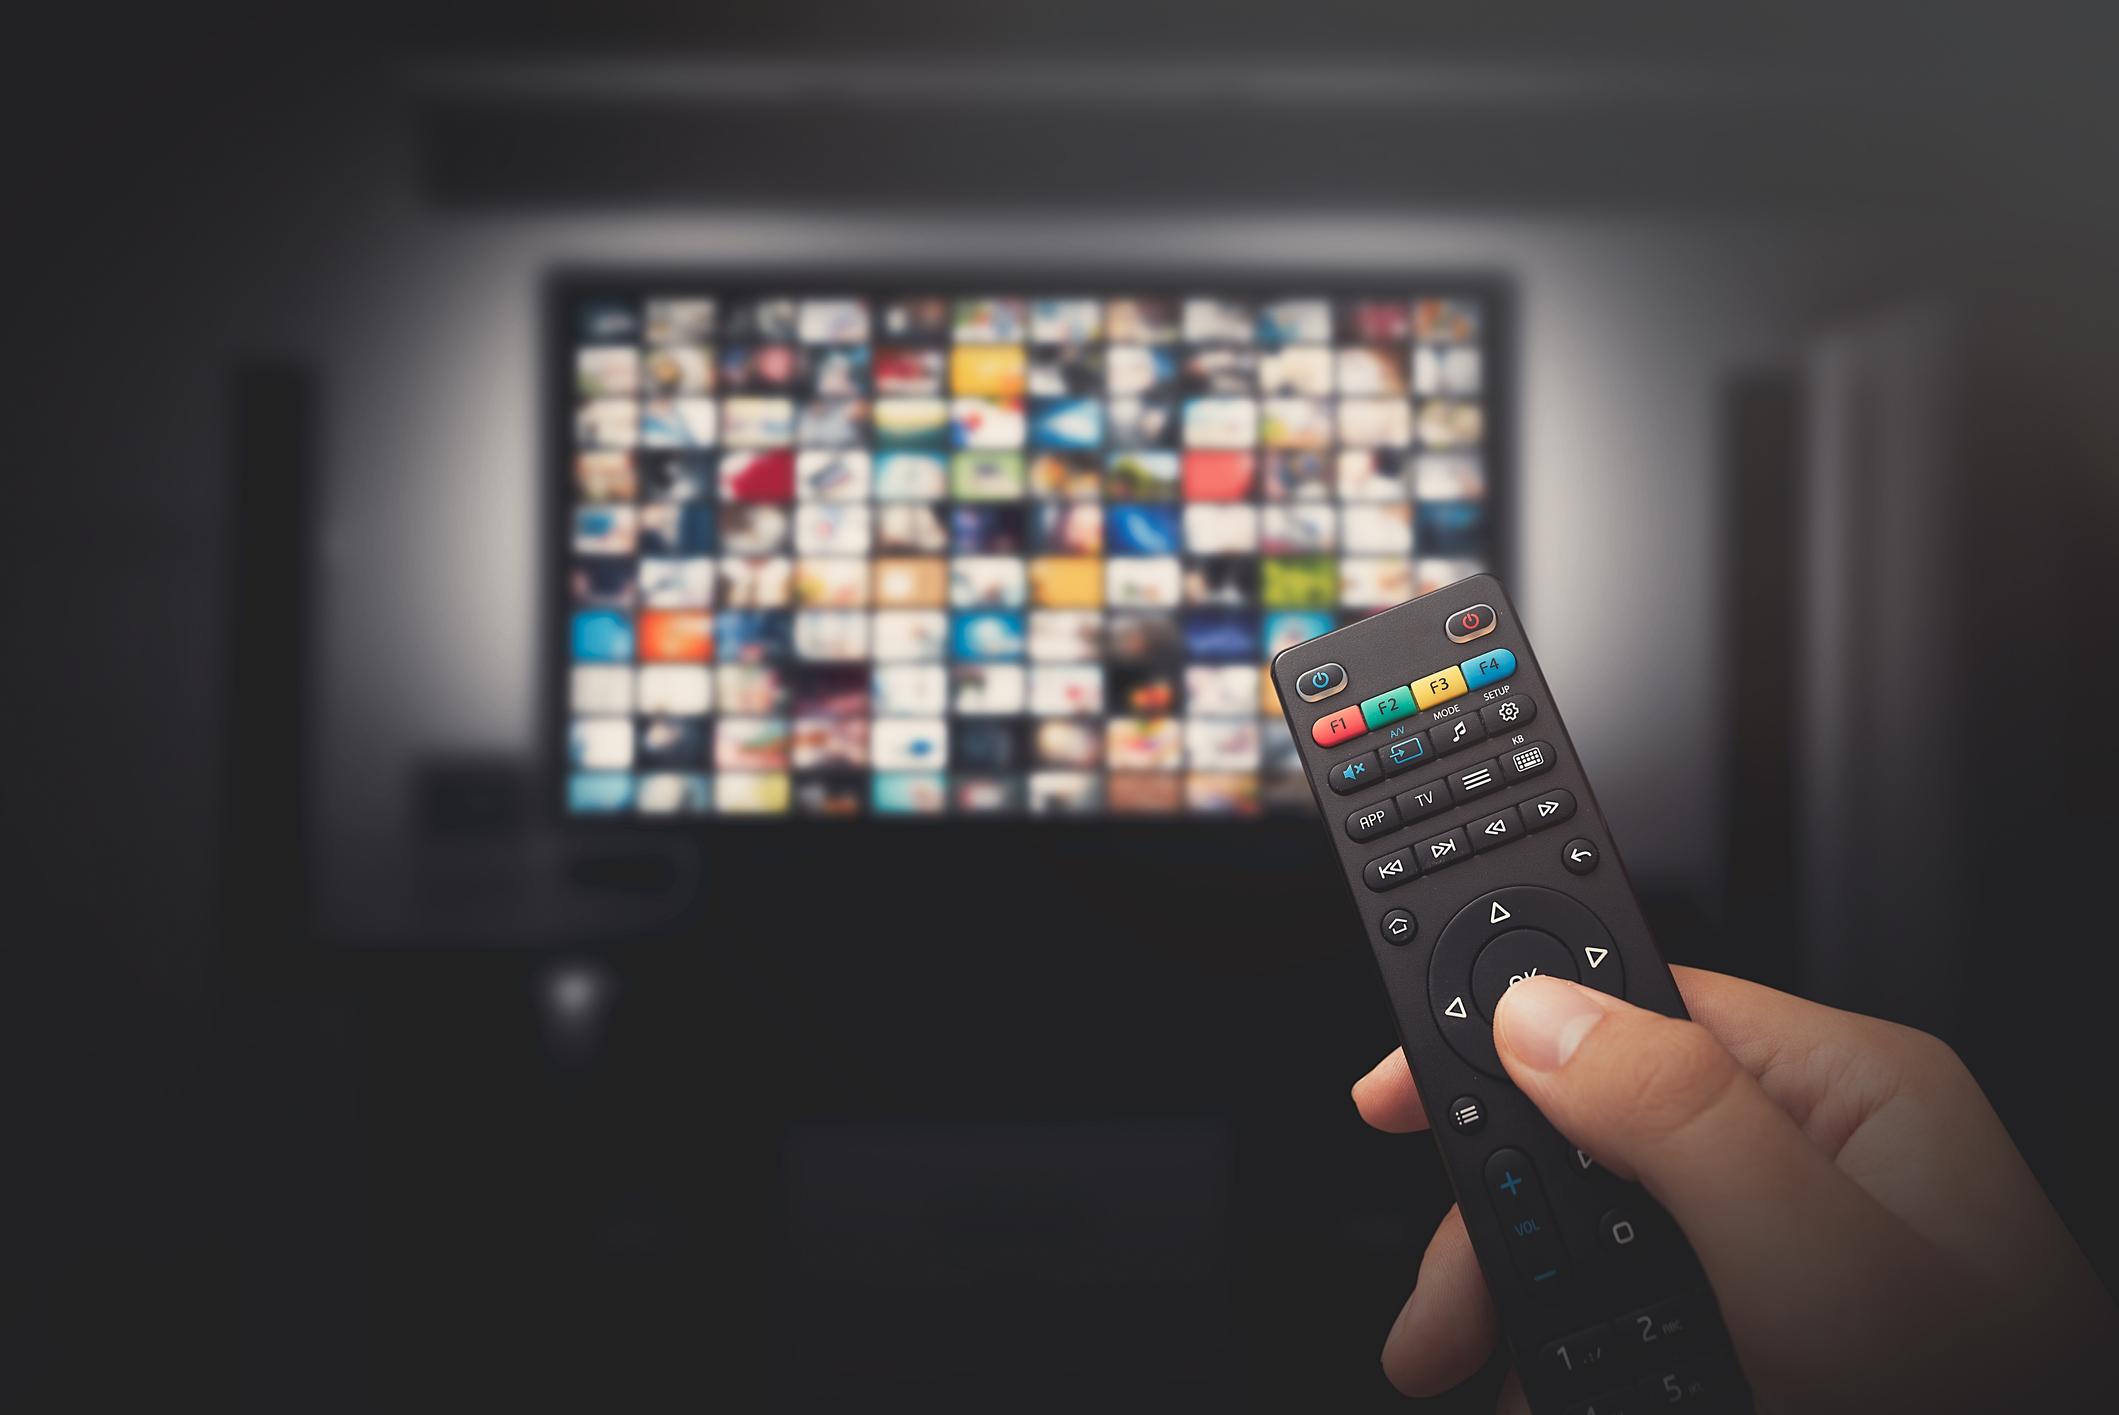 Netflix Nflx Stock Price News The Motley Fool